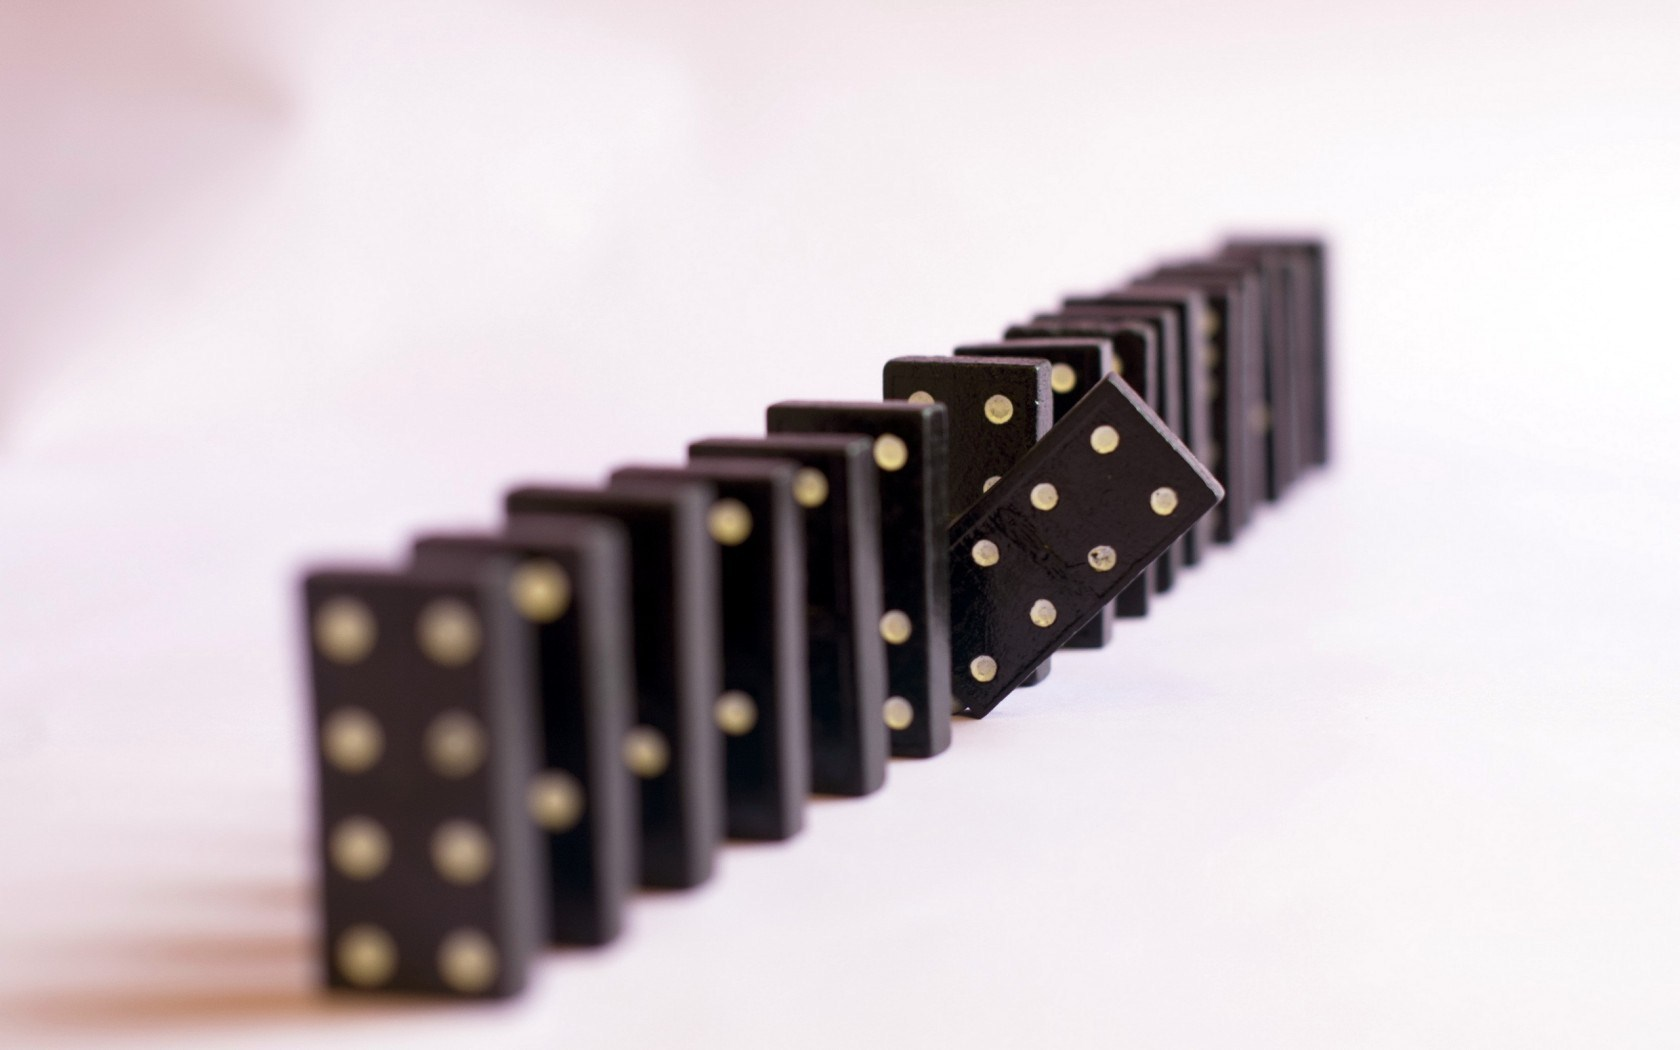 domino-pieces-game-wallpaper-1680x1050.jpg